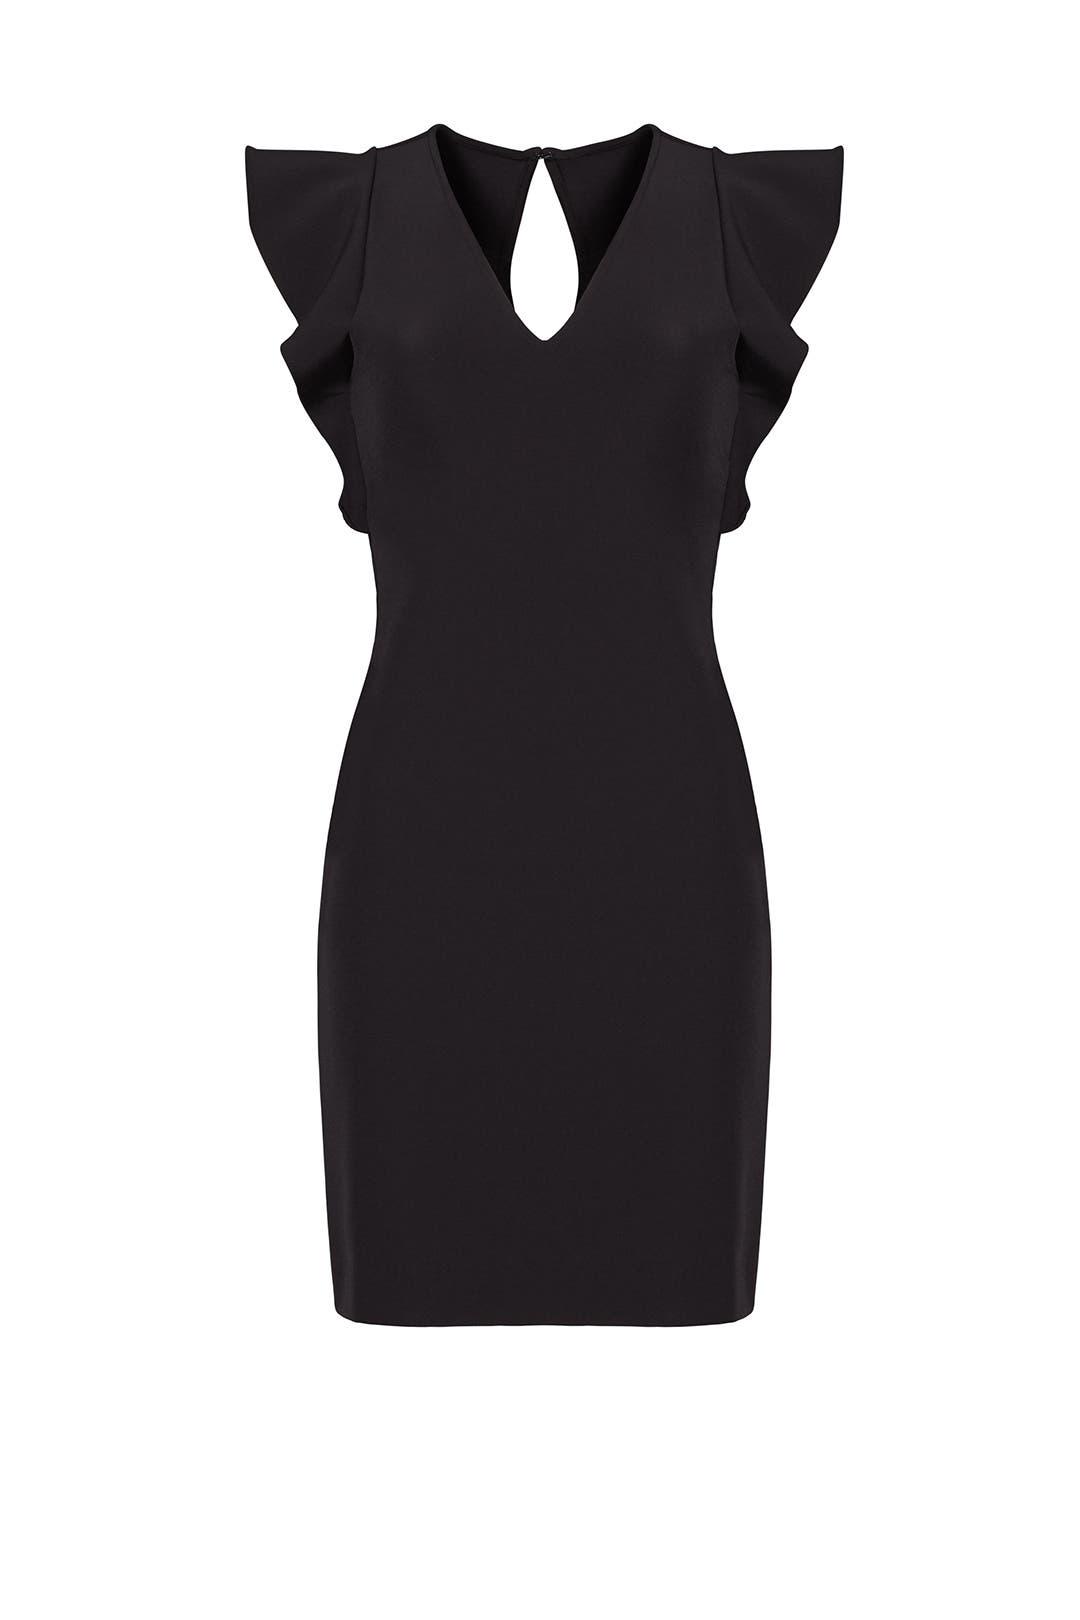 Black True Love Ruffle Dress by Yoana Baraschi for $30 - $50 ...